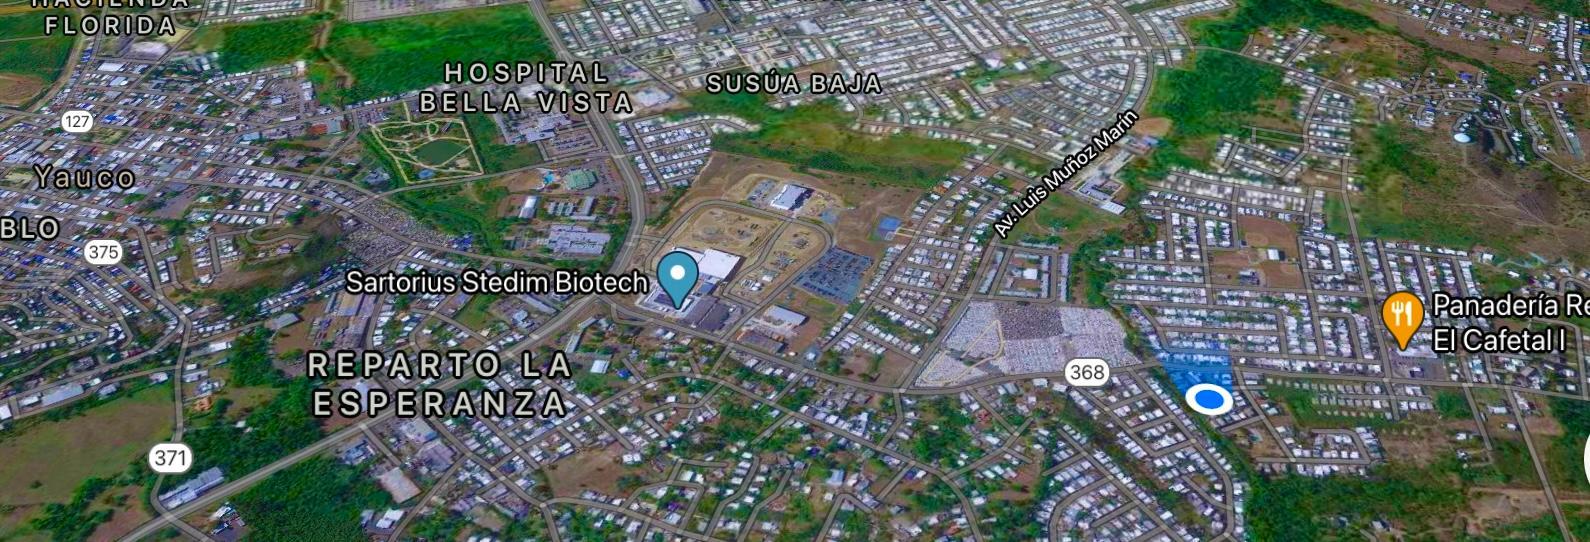 URB. ALTURAS DEL CAFETAL Yauco, PR 00698